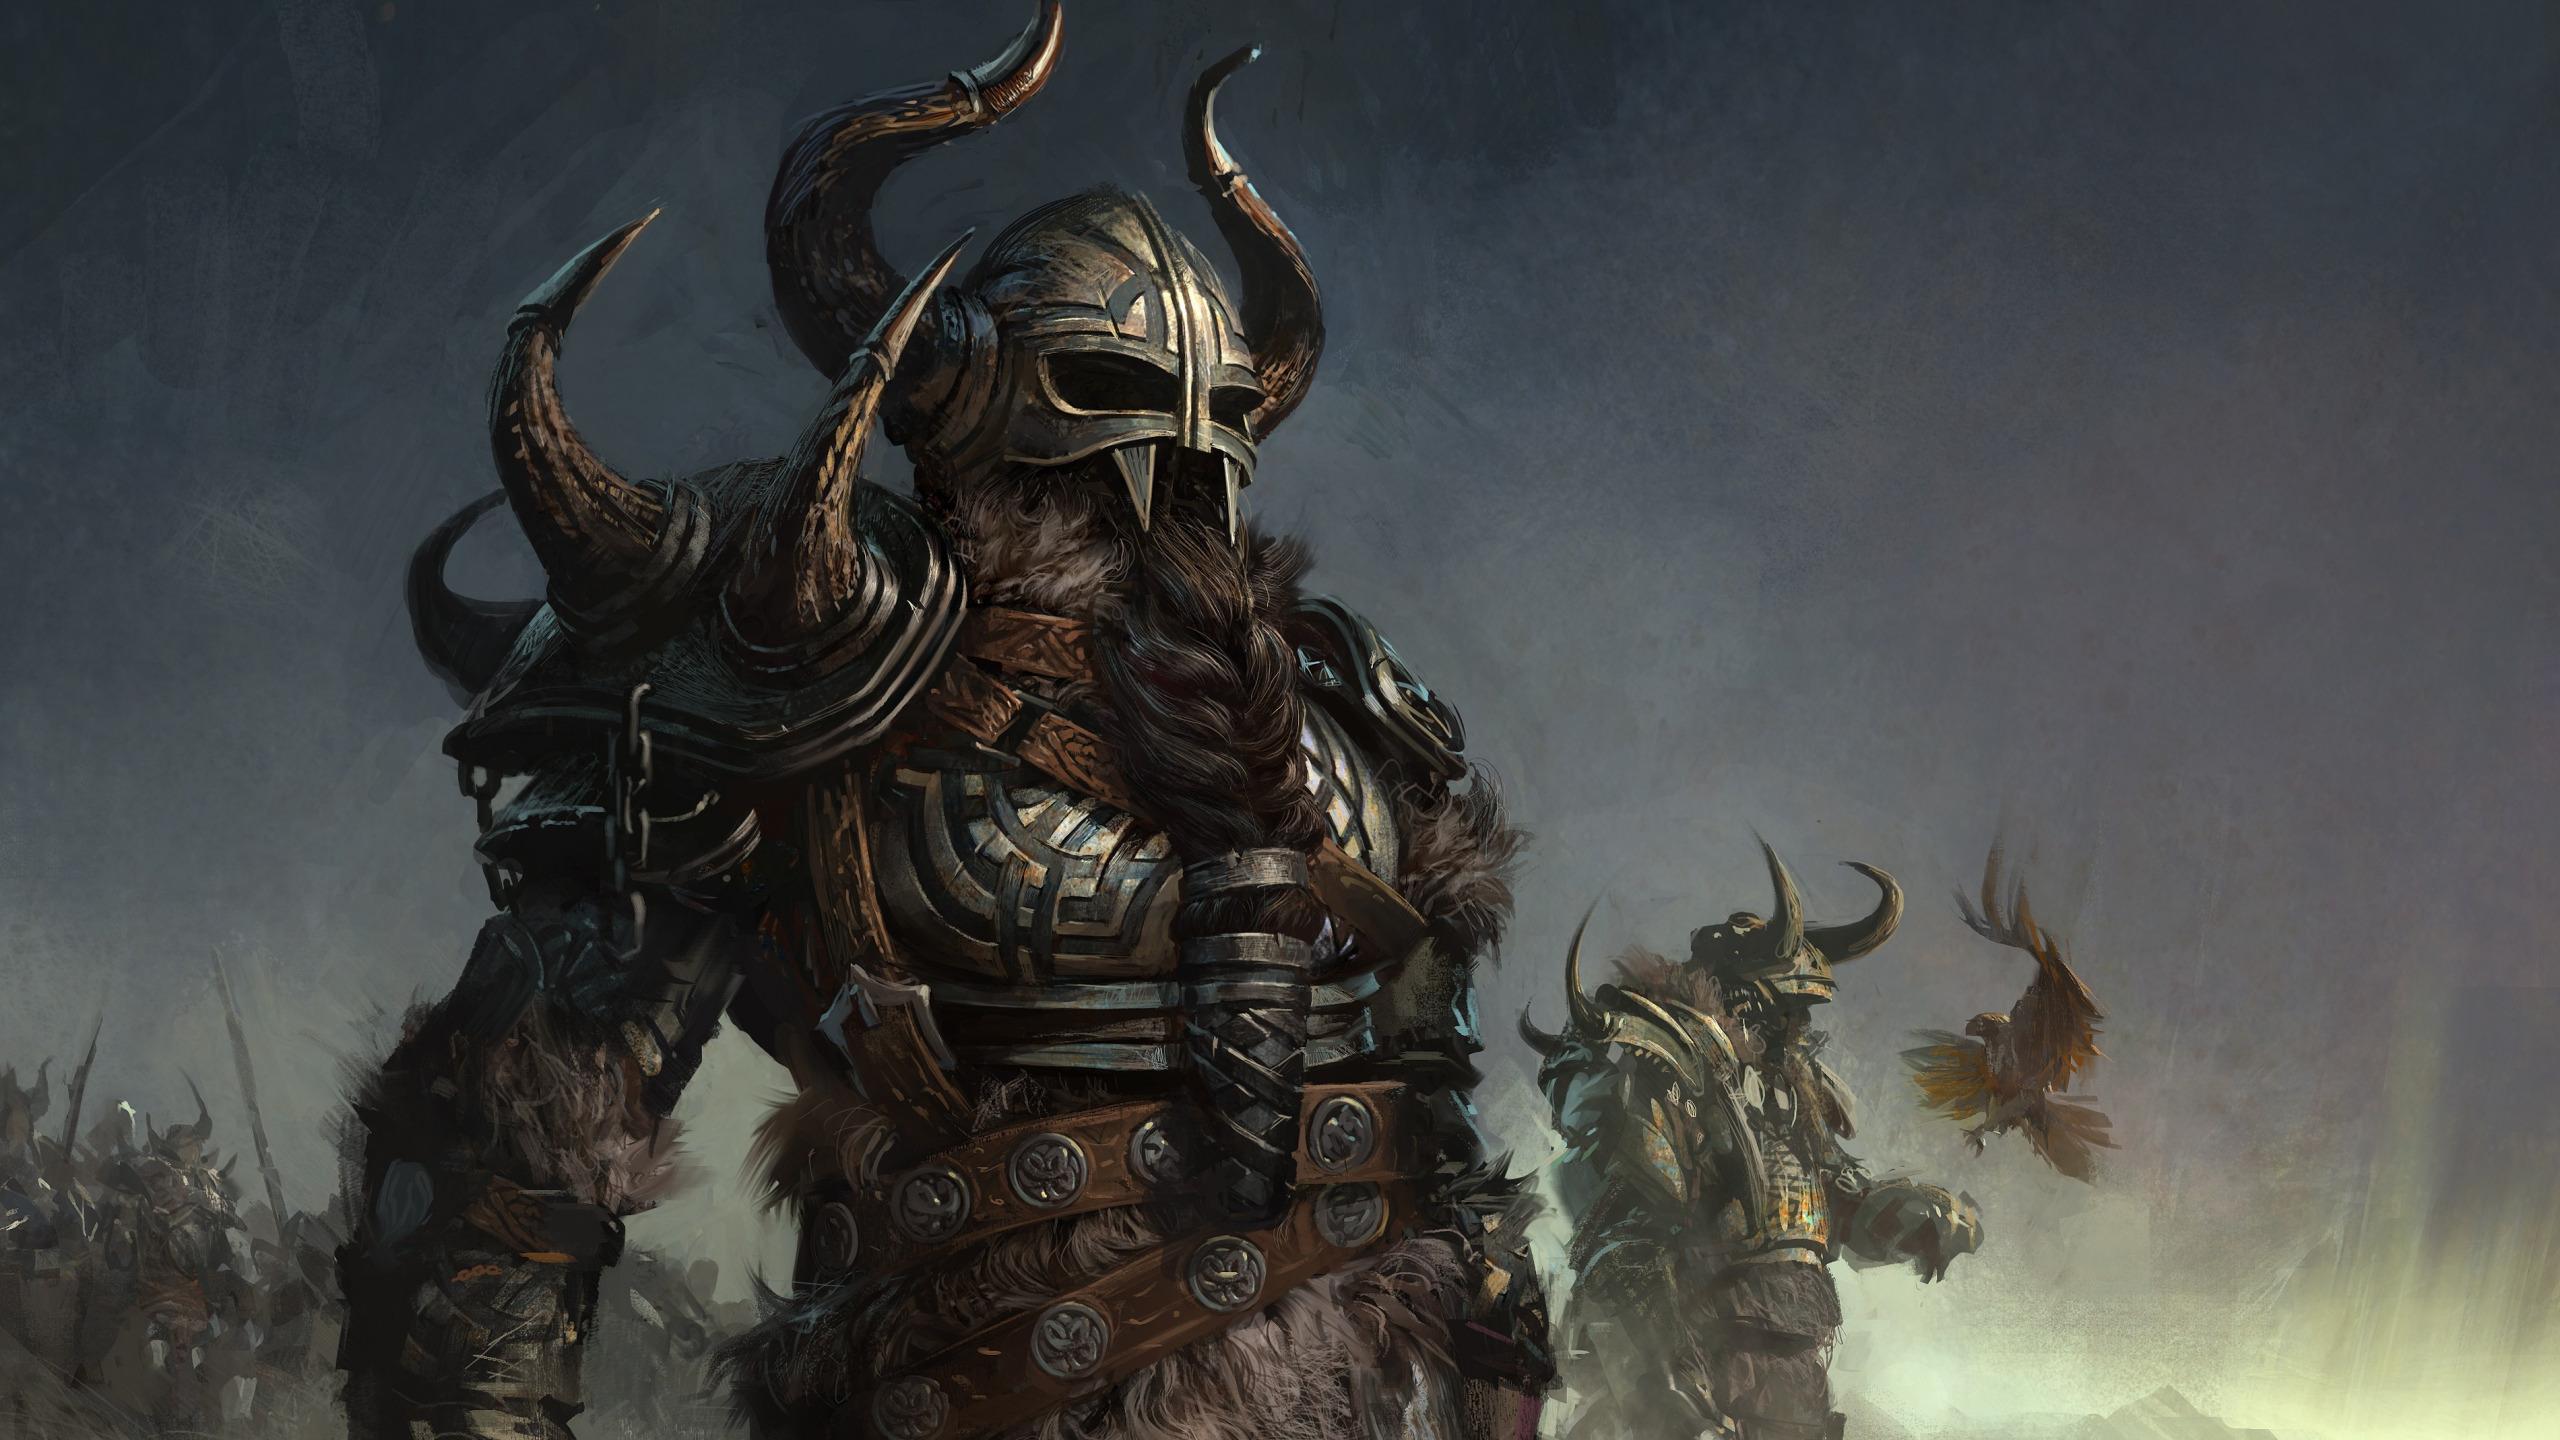 Download Wallpaper Guild Wars 2 Viking Viking Engineer Section